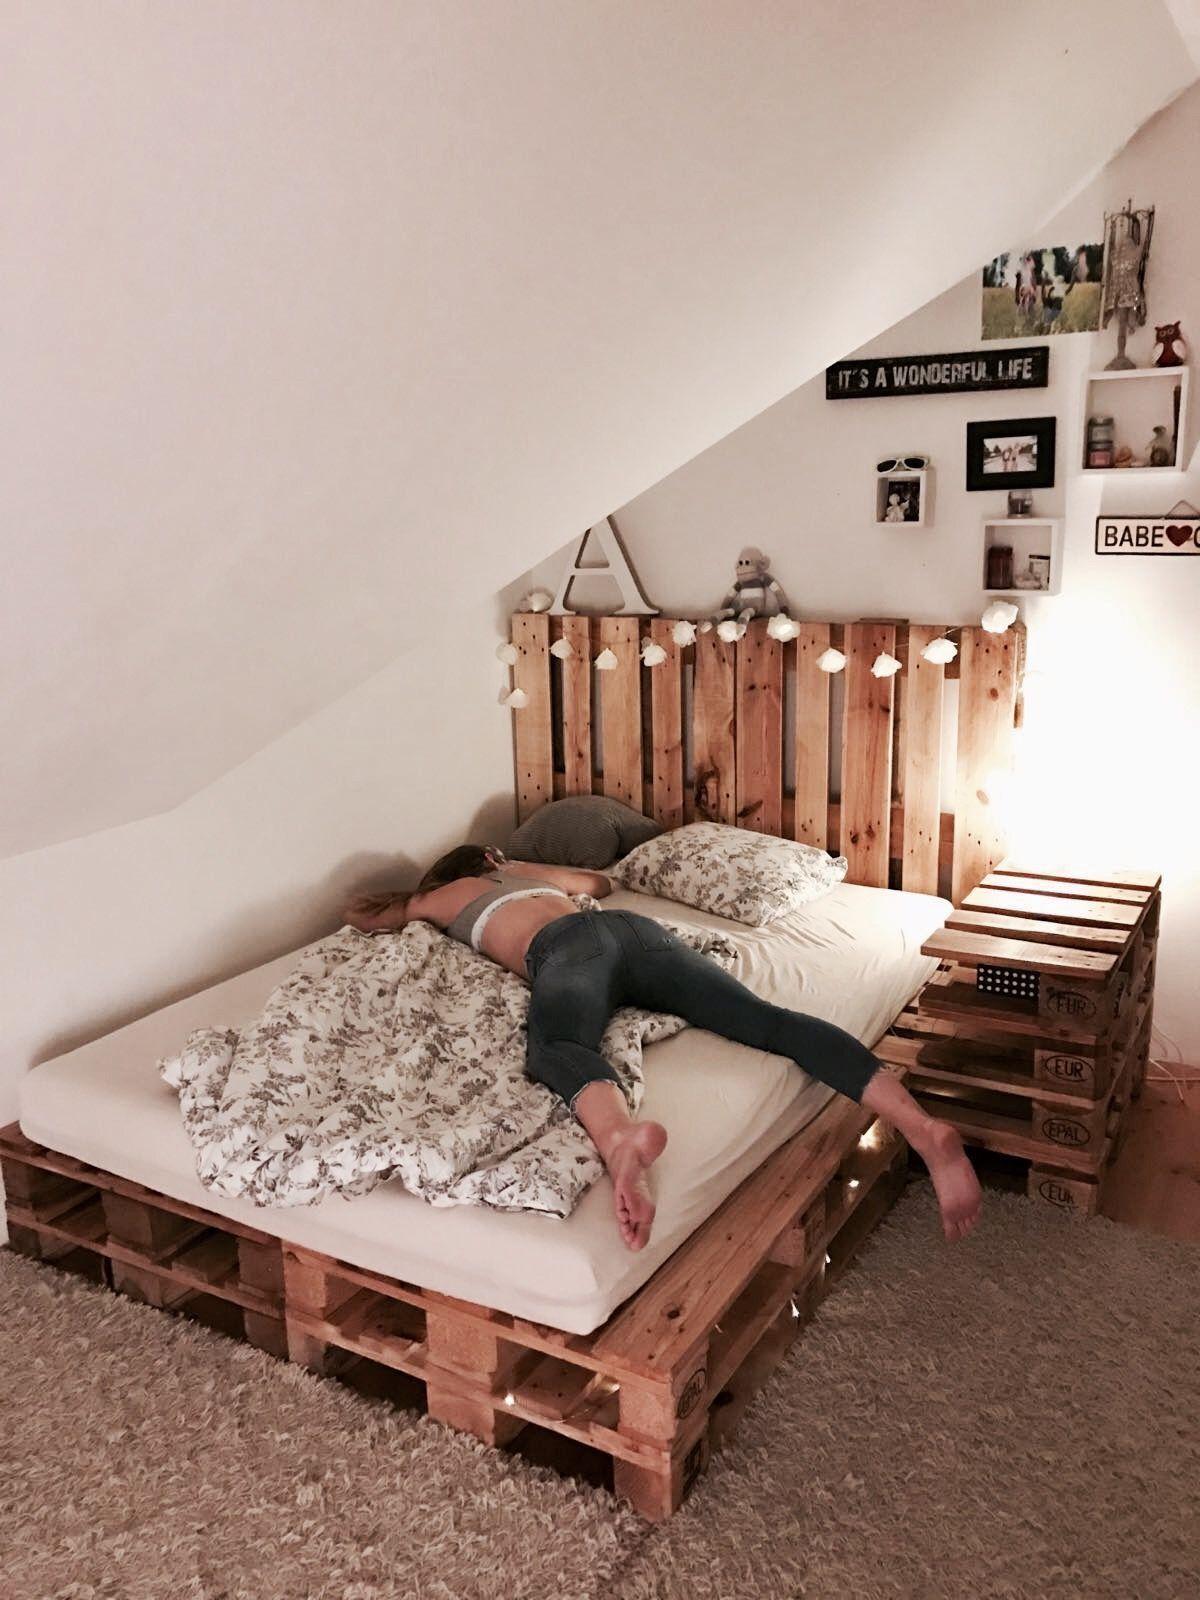 Pin By Jordan Gensits On New Bedroom Ideas Remodel Bedroom Bedroom Decor Bedroom Design